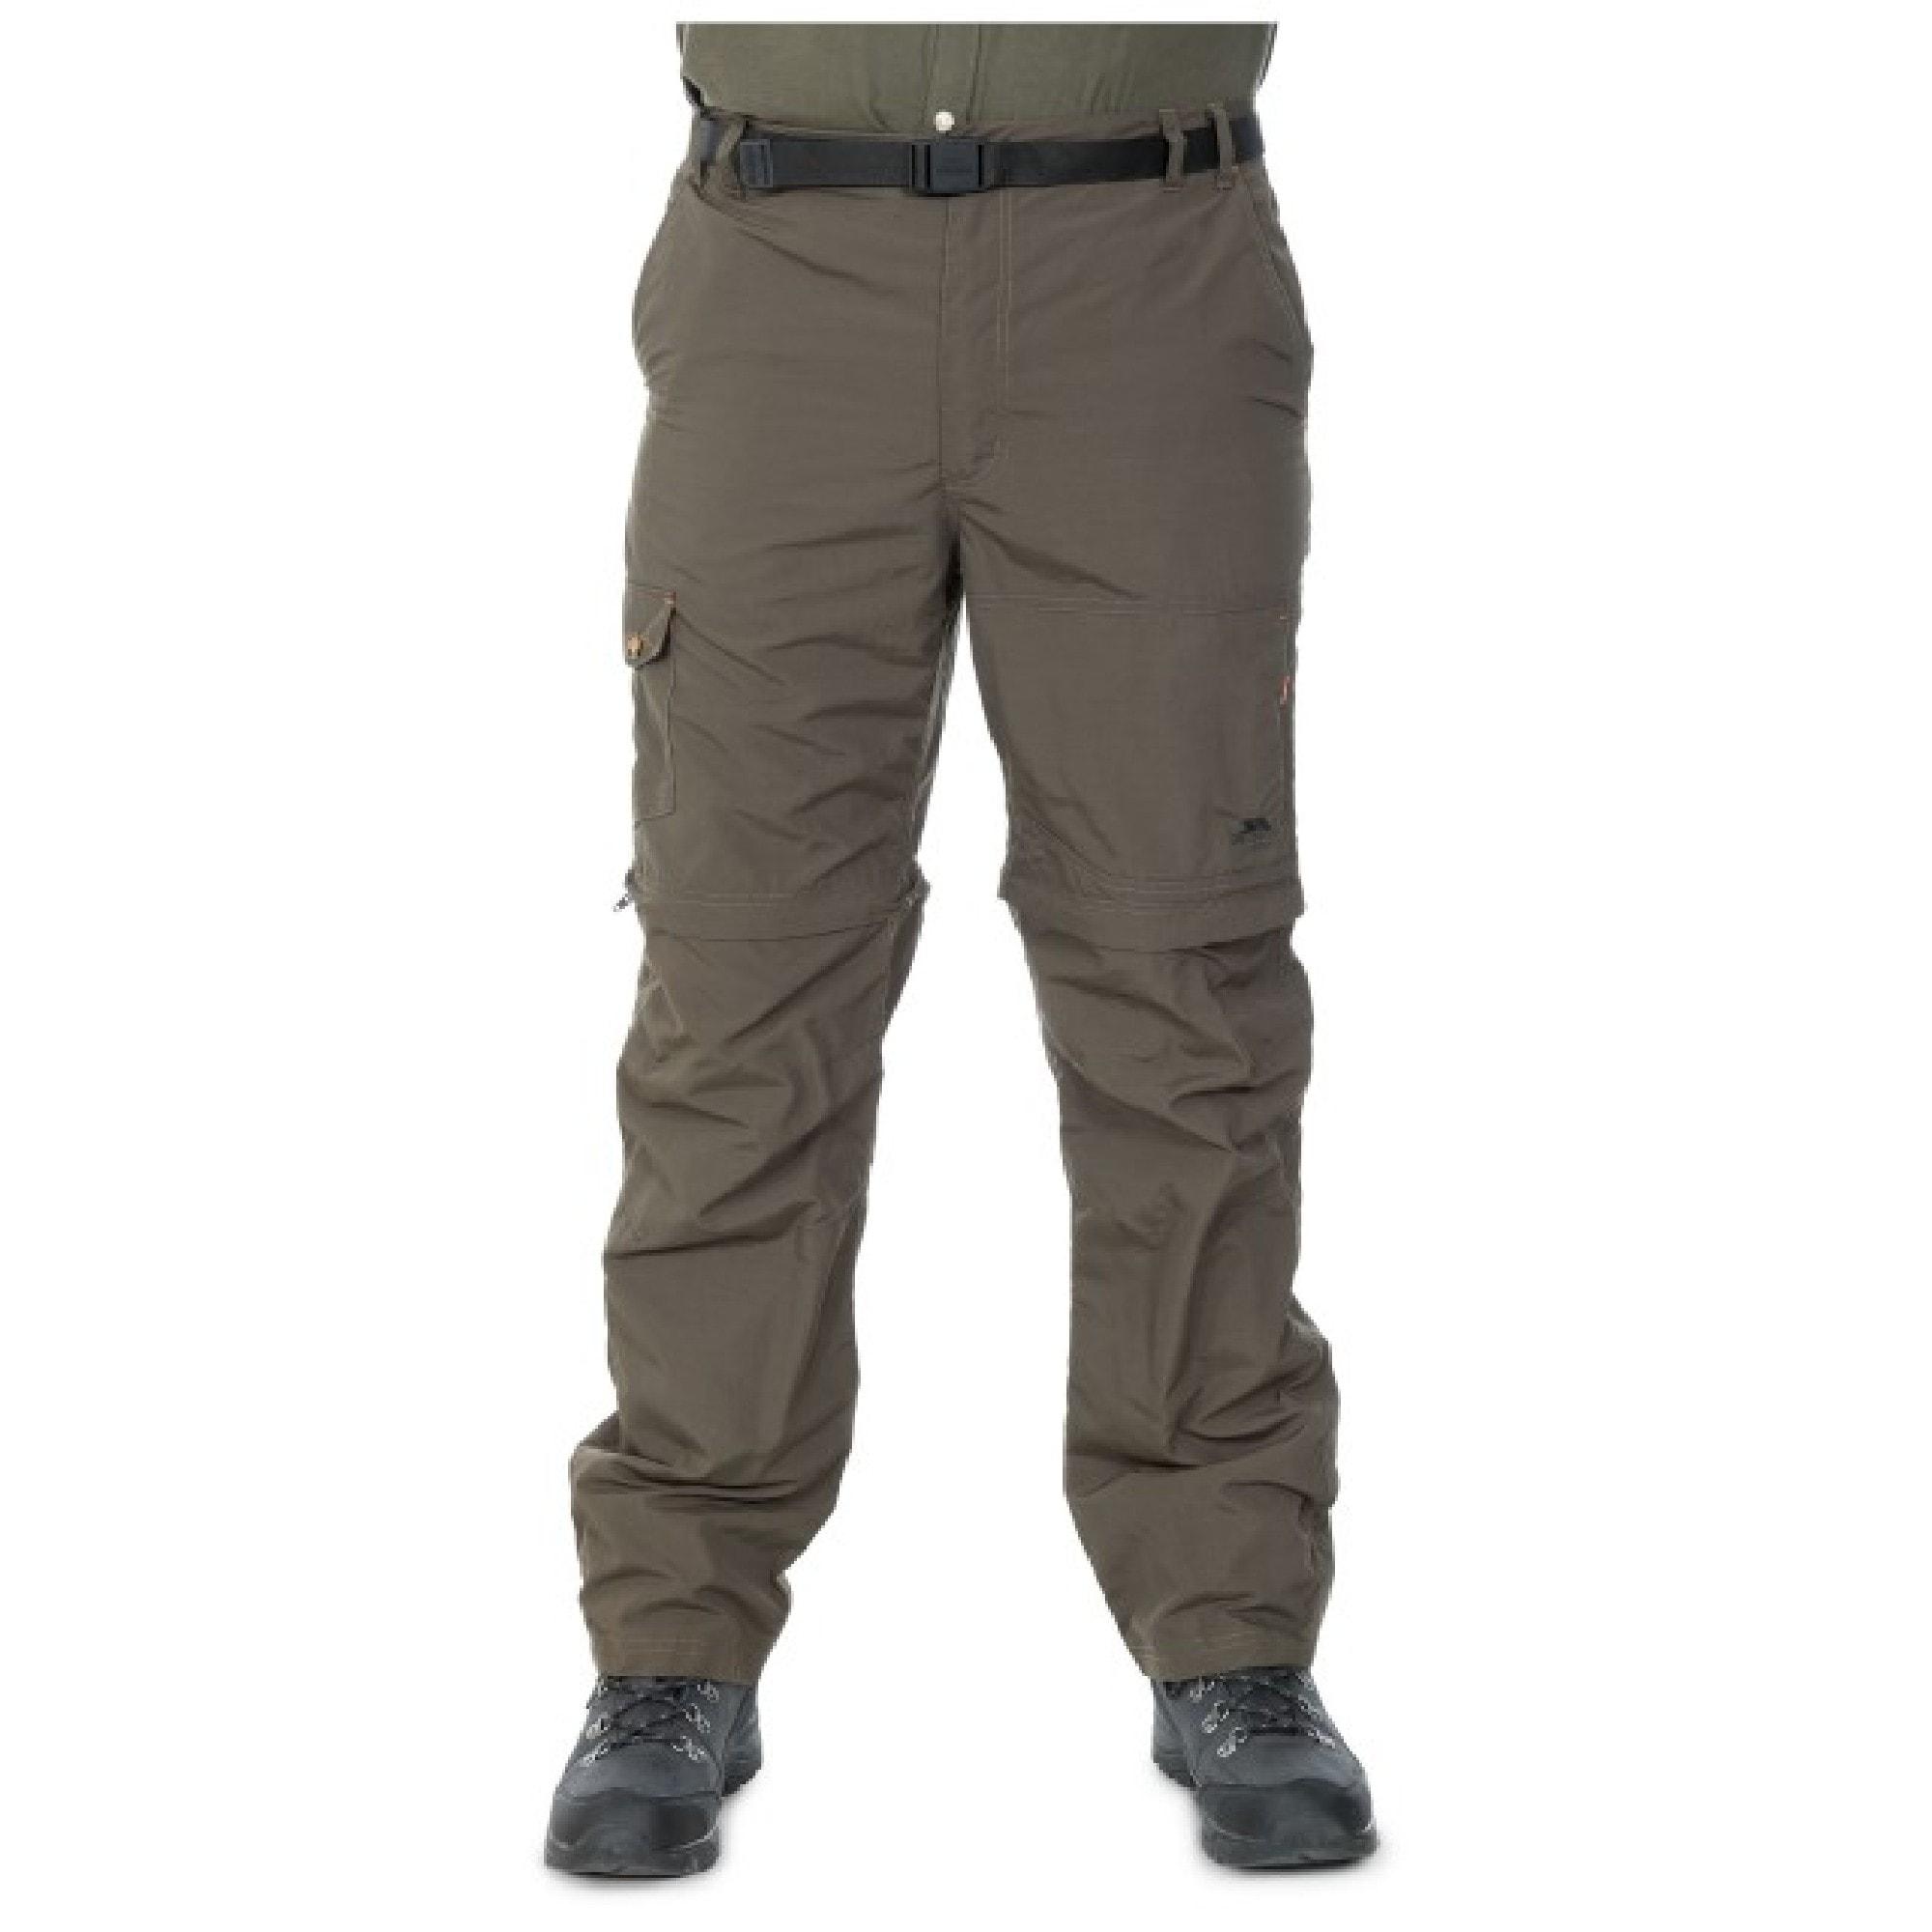 Trespass Trekkinghose Herren Rynne Moskitophobia   Sportbekleidung > Sporthosen > Trekkinghosen   Trespass